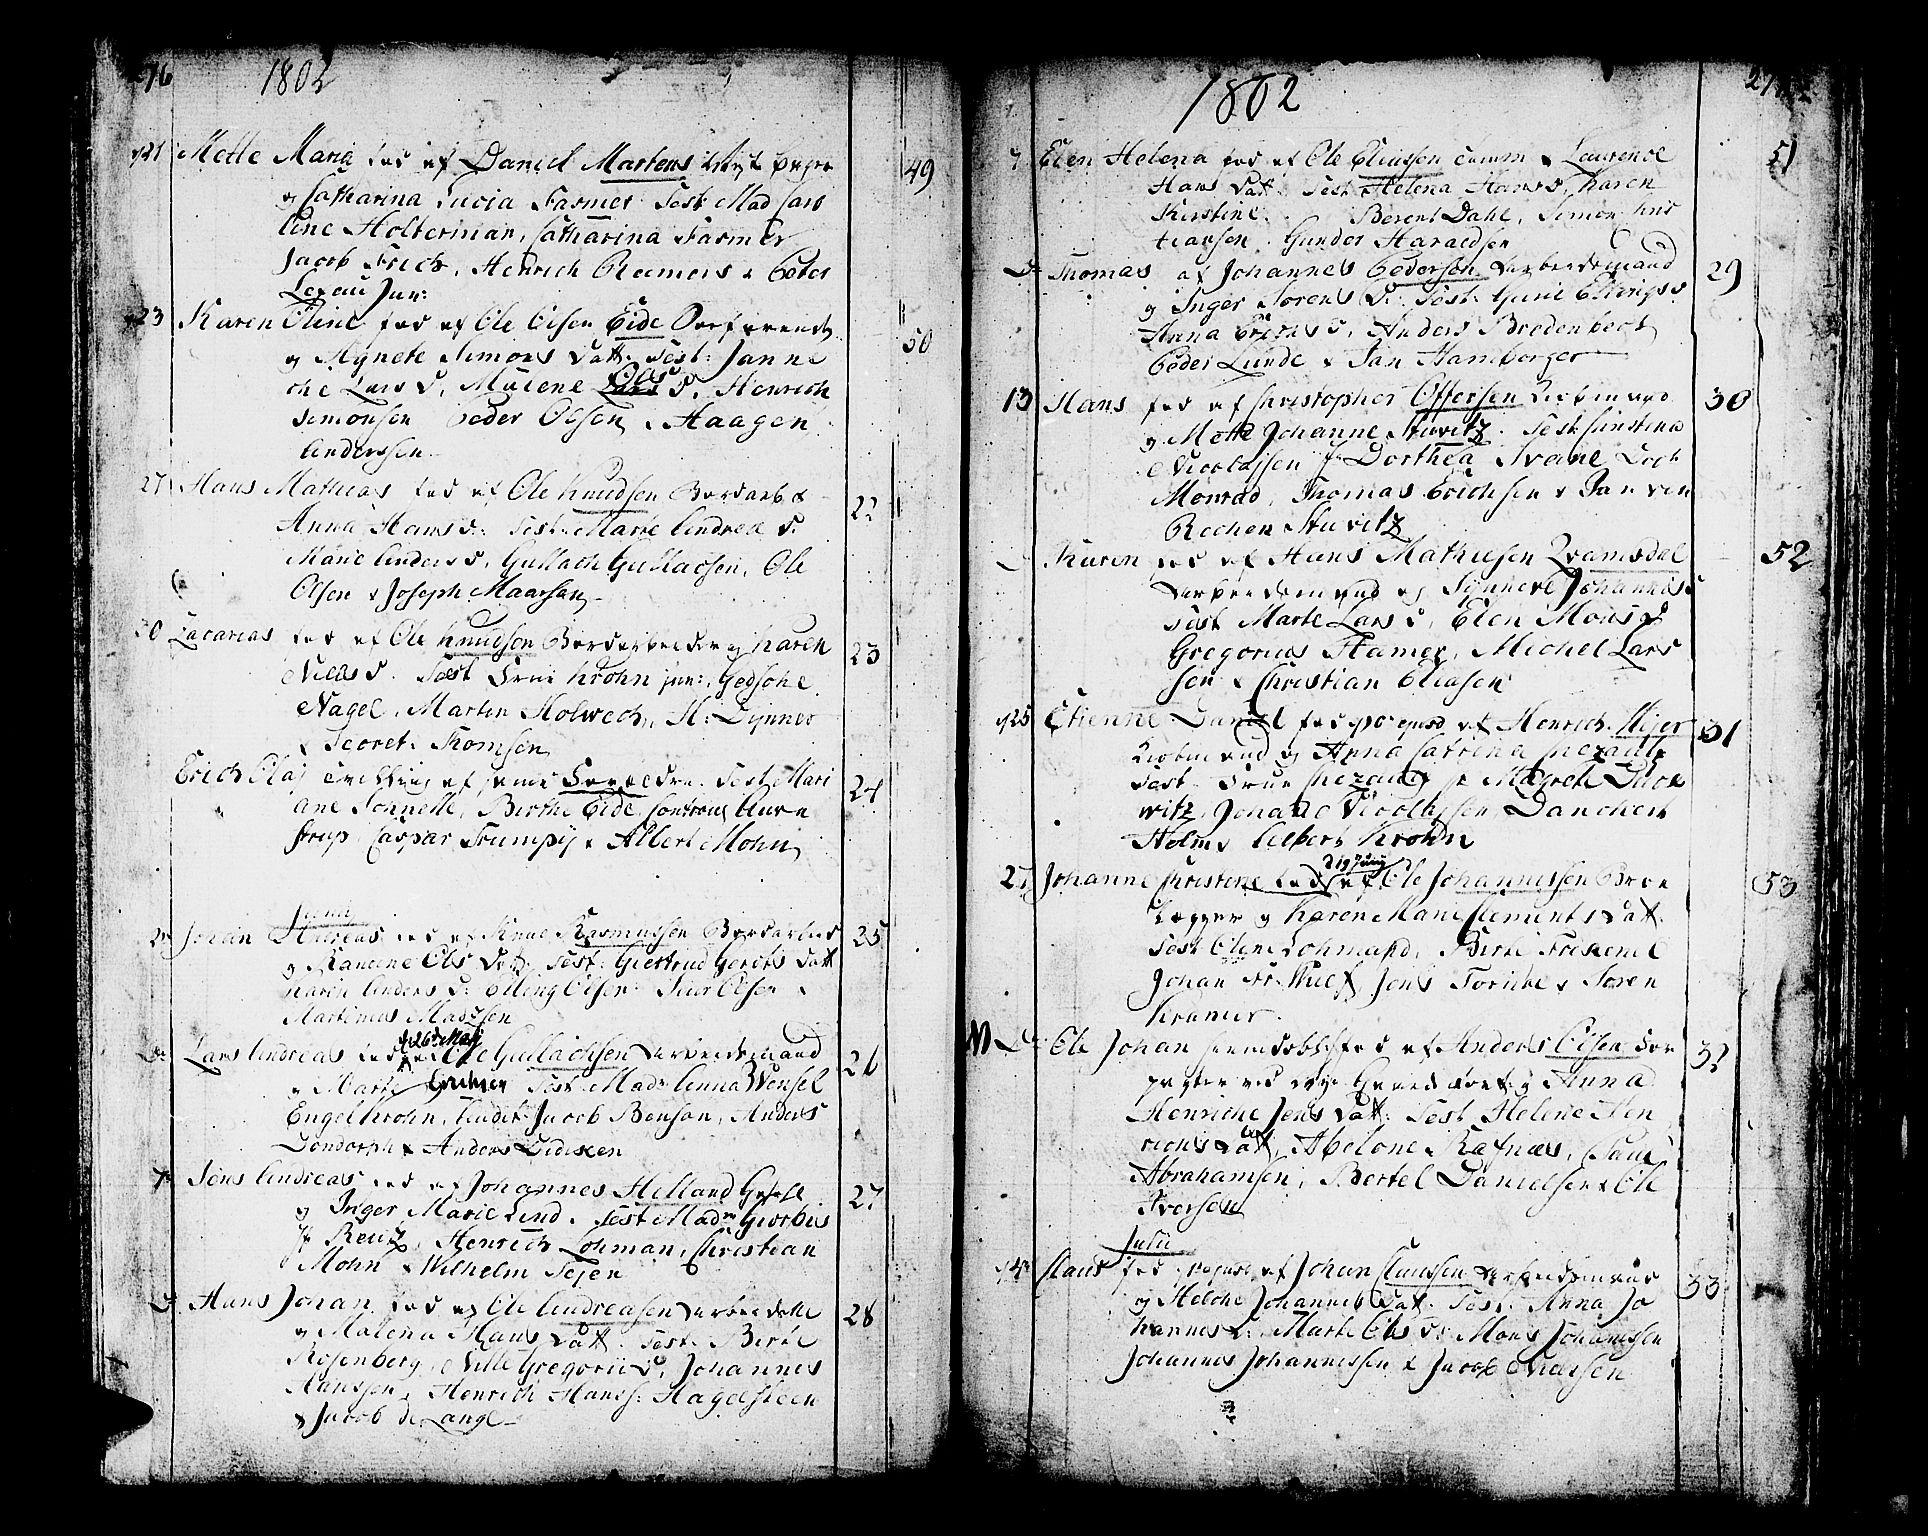 SAB, Domkirken sokneprestembete, H/Haa/L0004: Ministerialbok nr. A 4, 1763-1820, s. 276-277